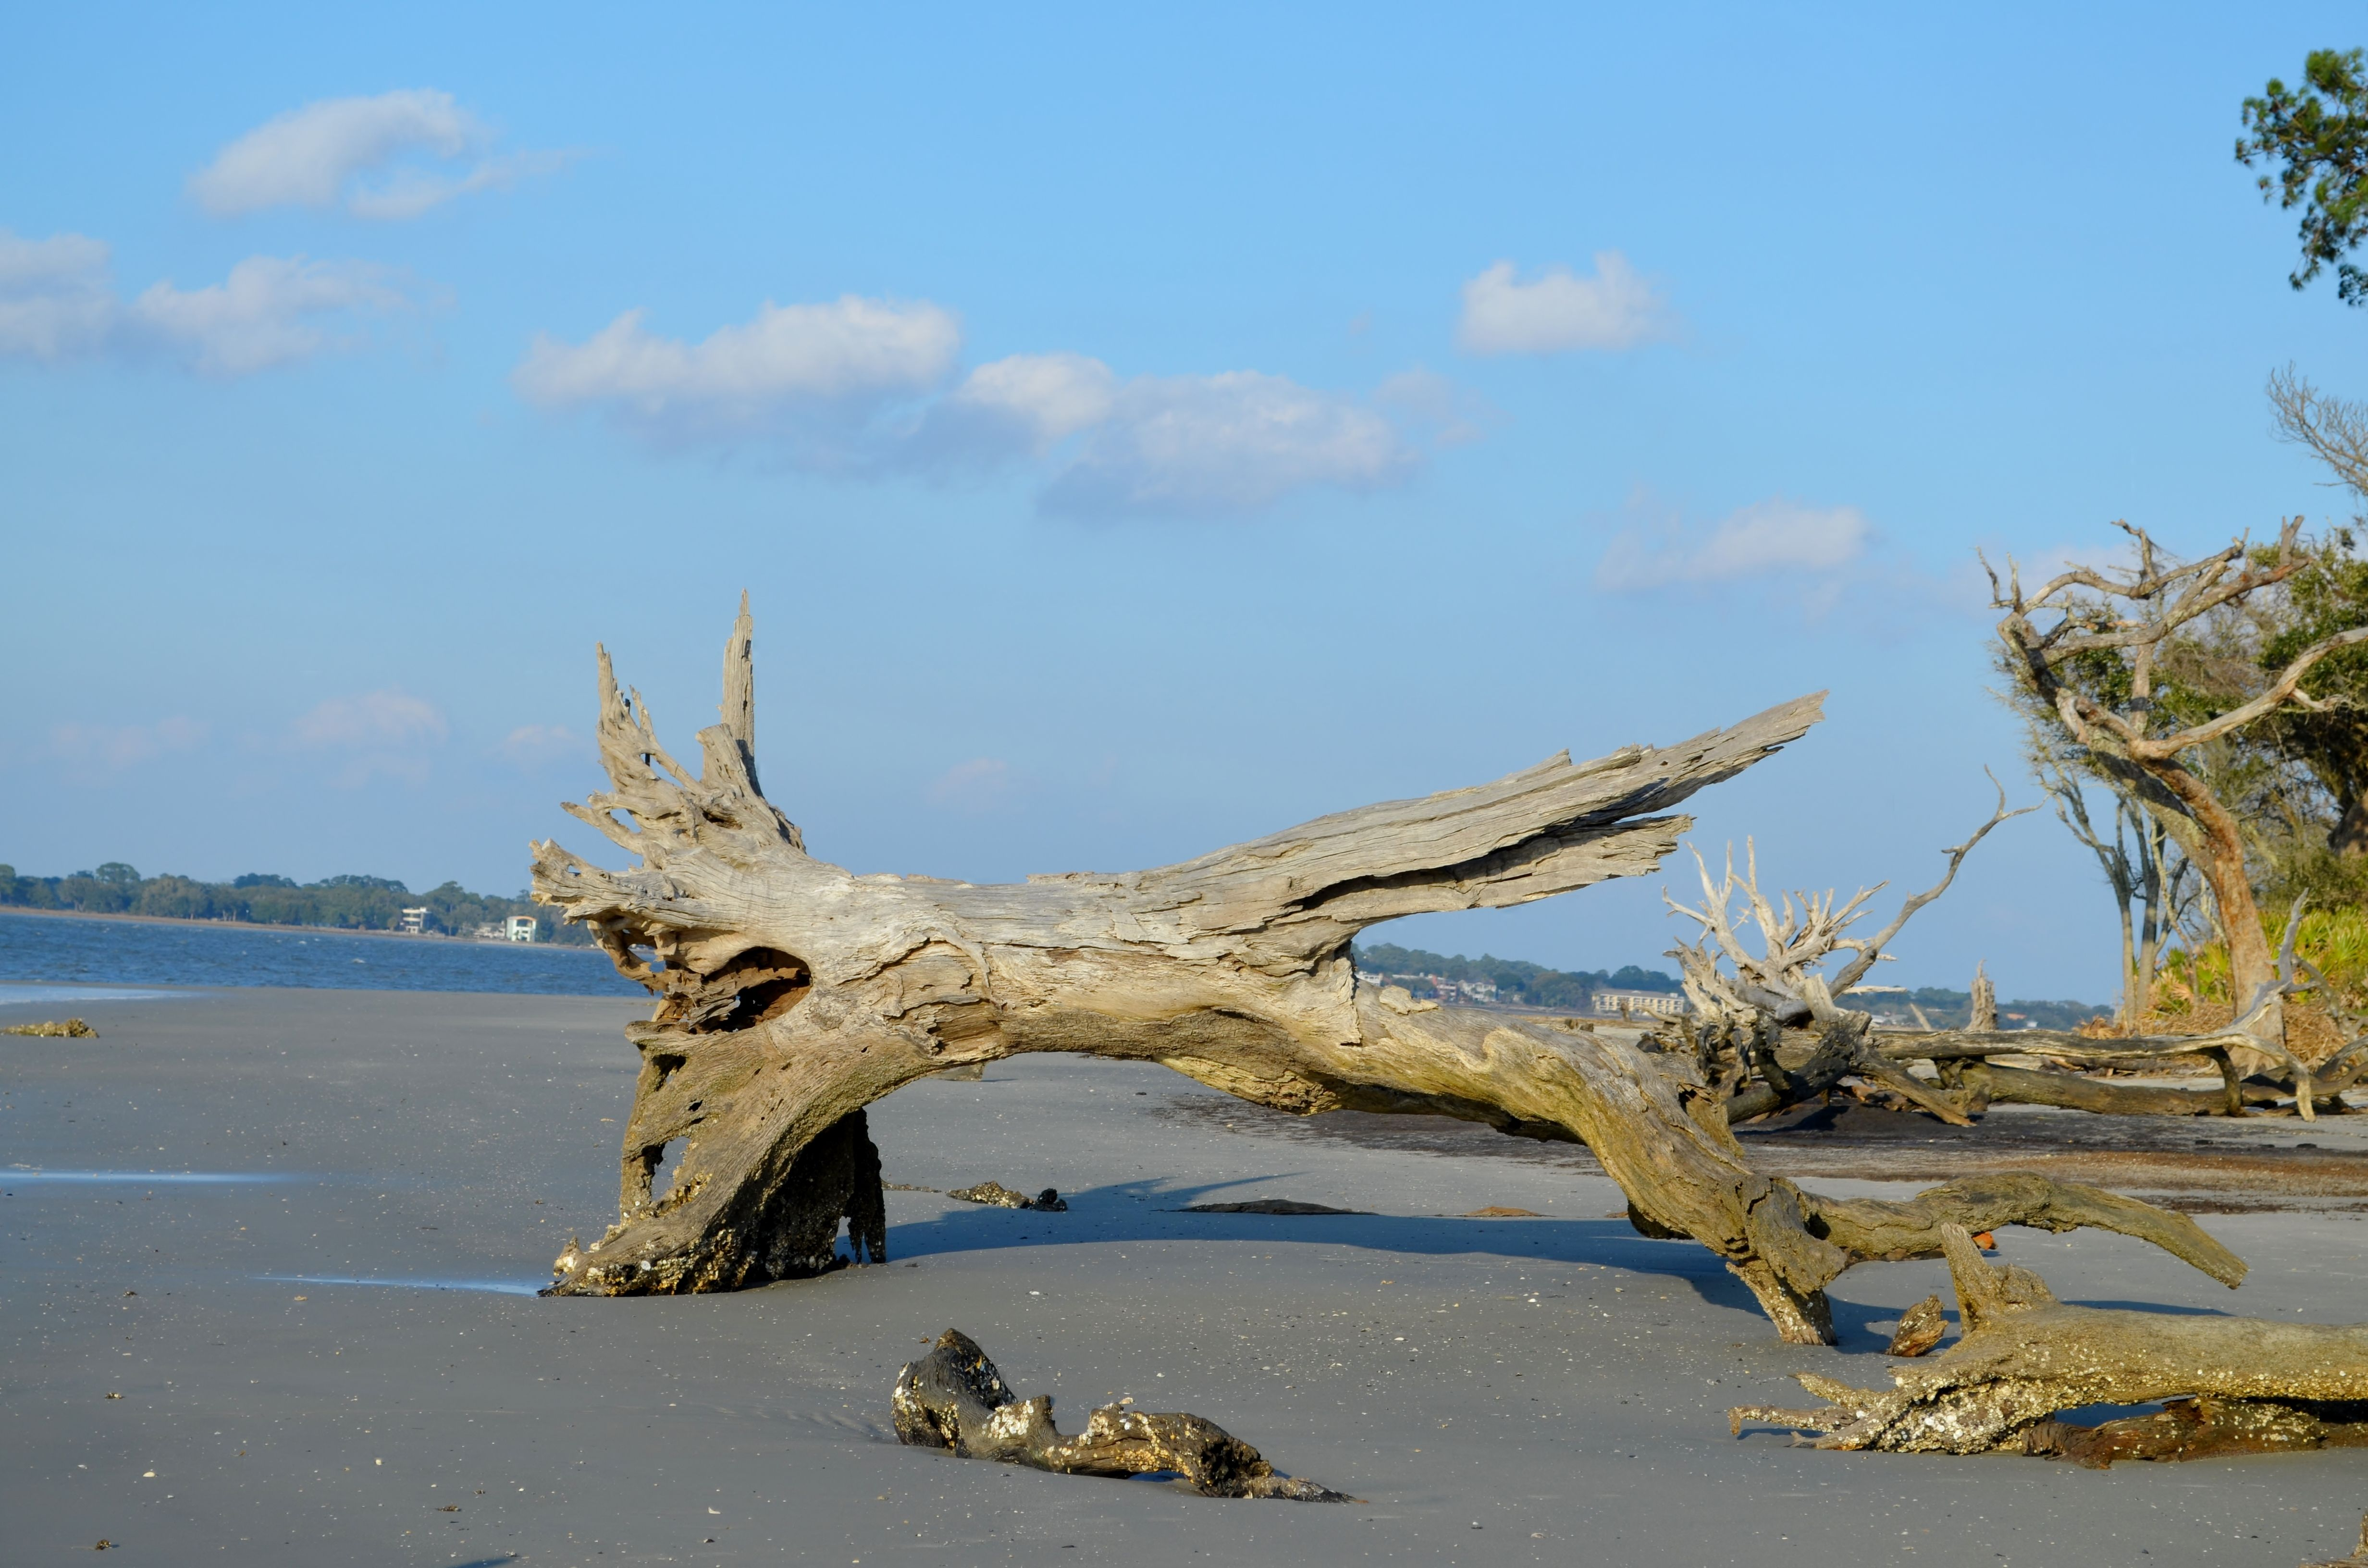 Driftwood beach at jekyll island 42713